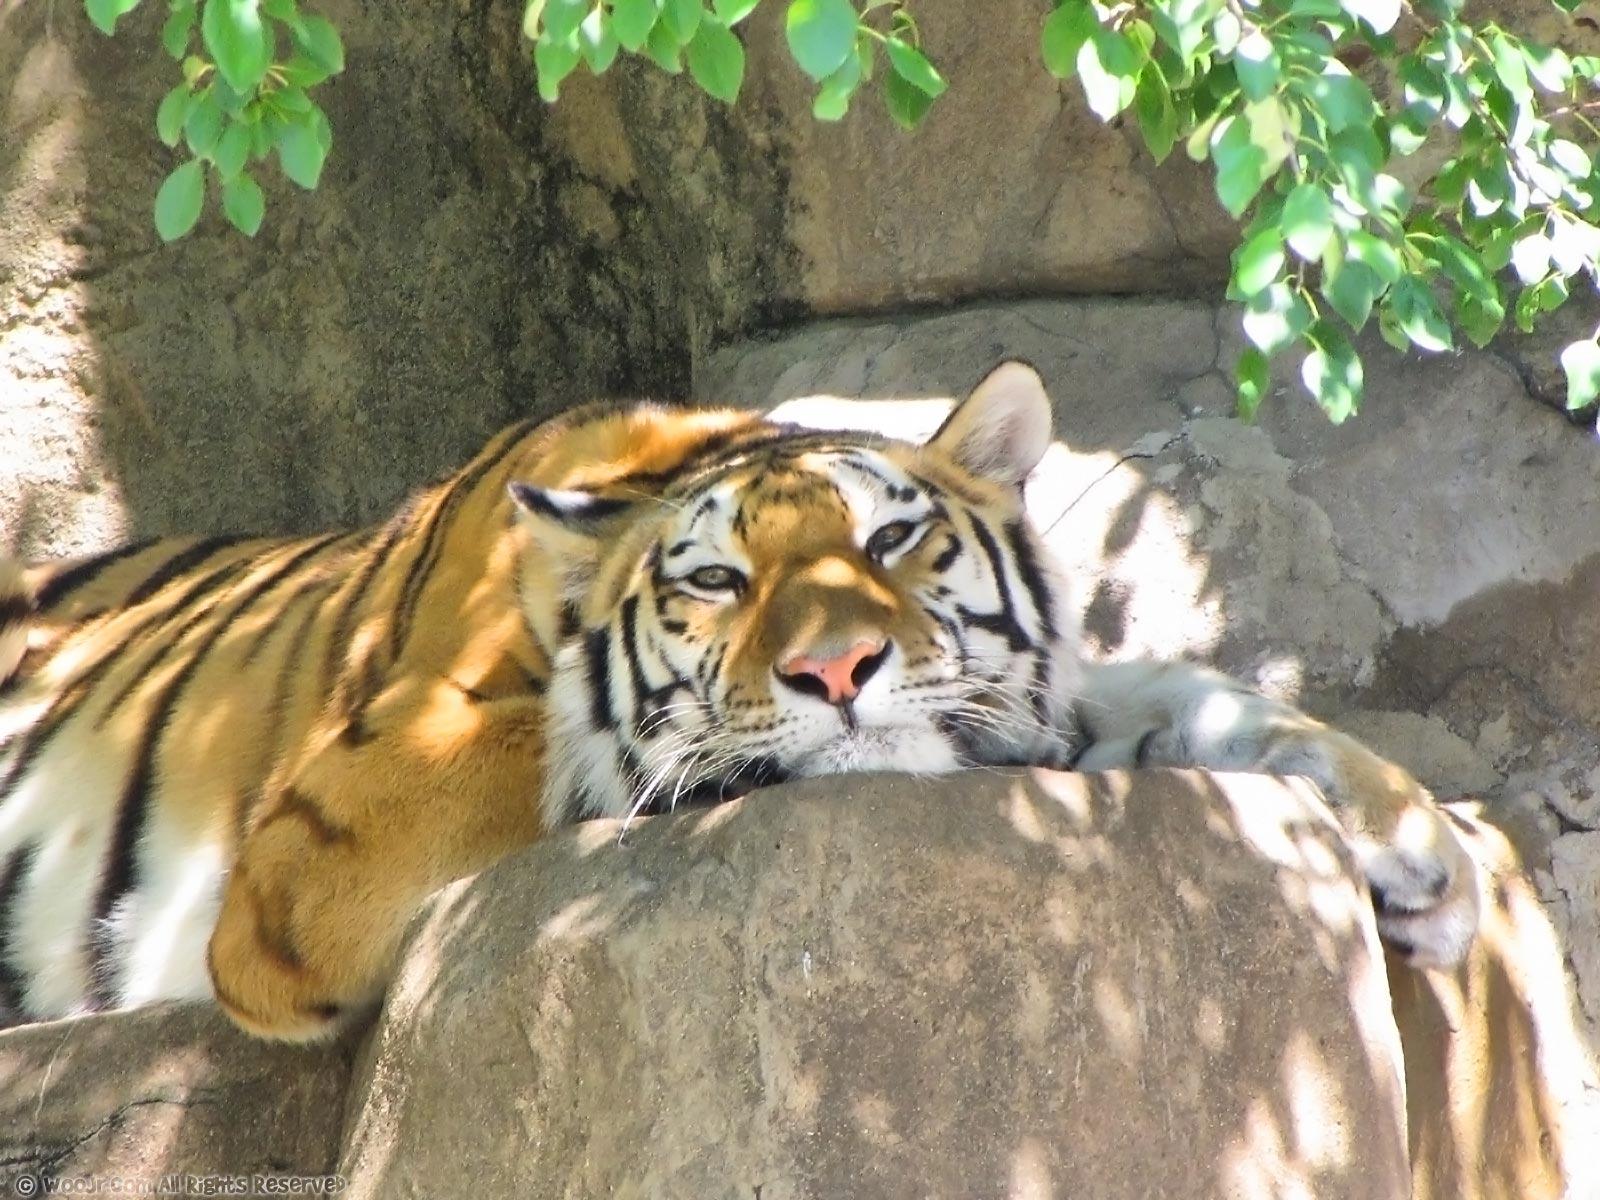 Tiger Wallpaper 1600 X - Zoo Animal , HD Wallpaper & Backgrounds